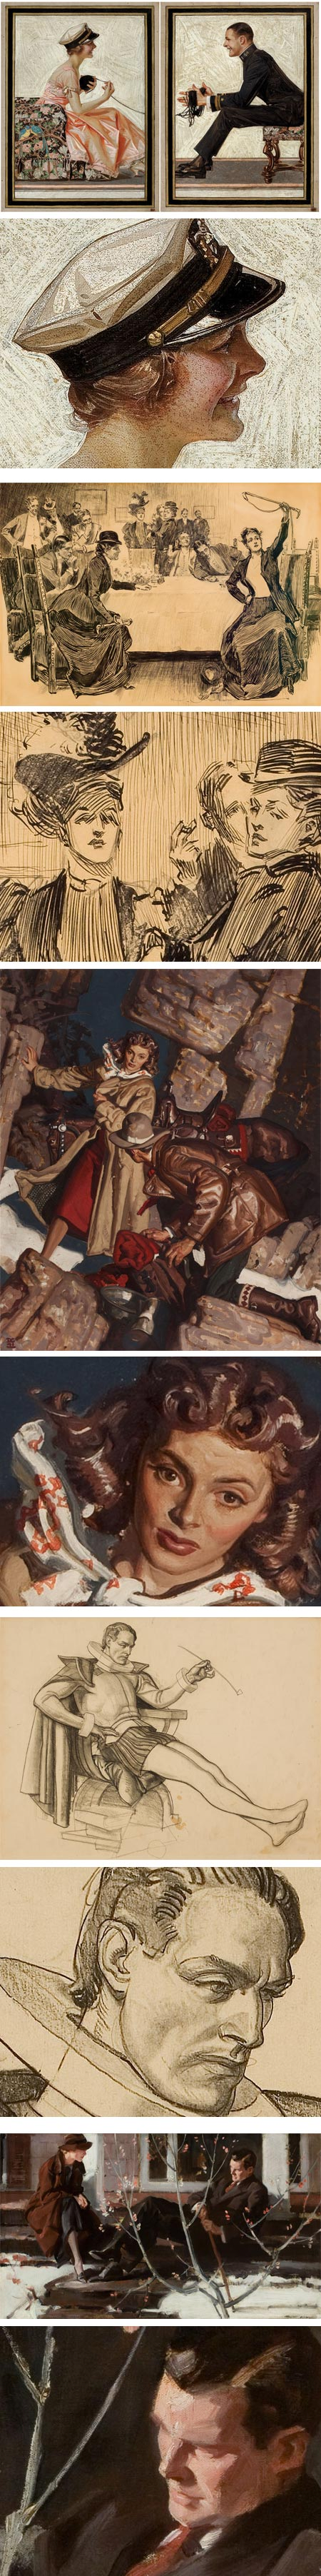 J.C. Leyendecker, Charles Dana Gibson, Dean Cornwell (painting), Dean Cornwell (drawing), Pruett Carter